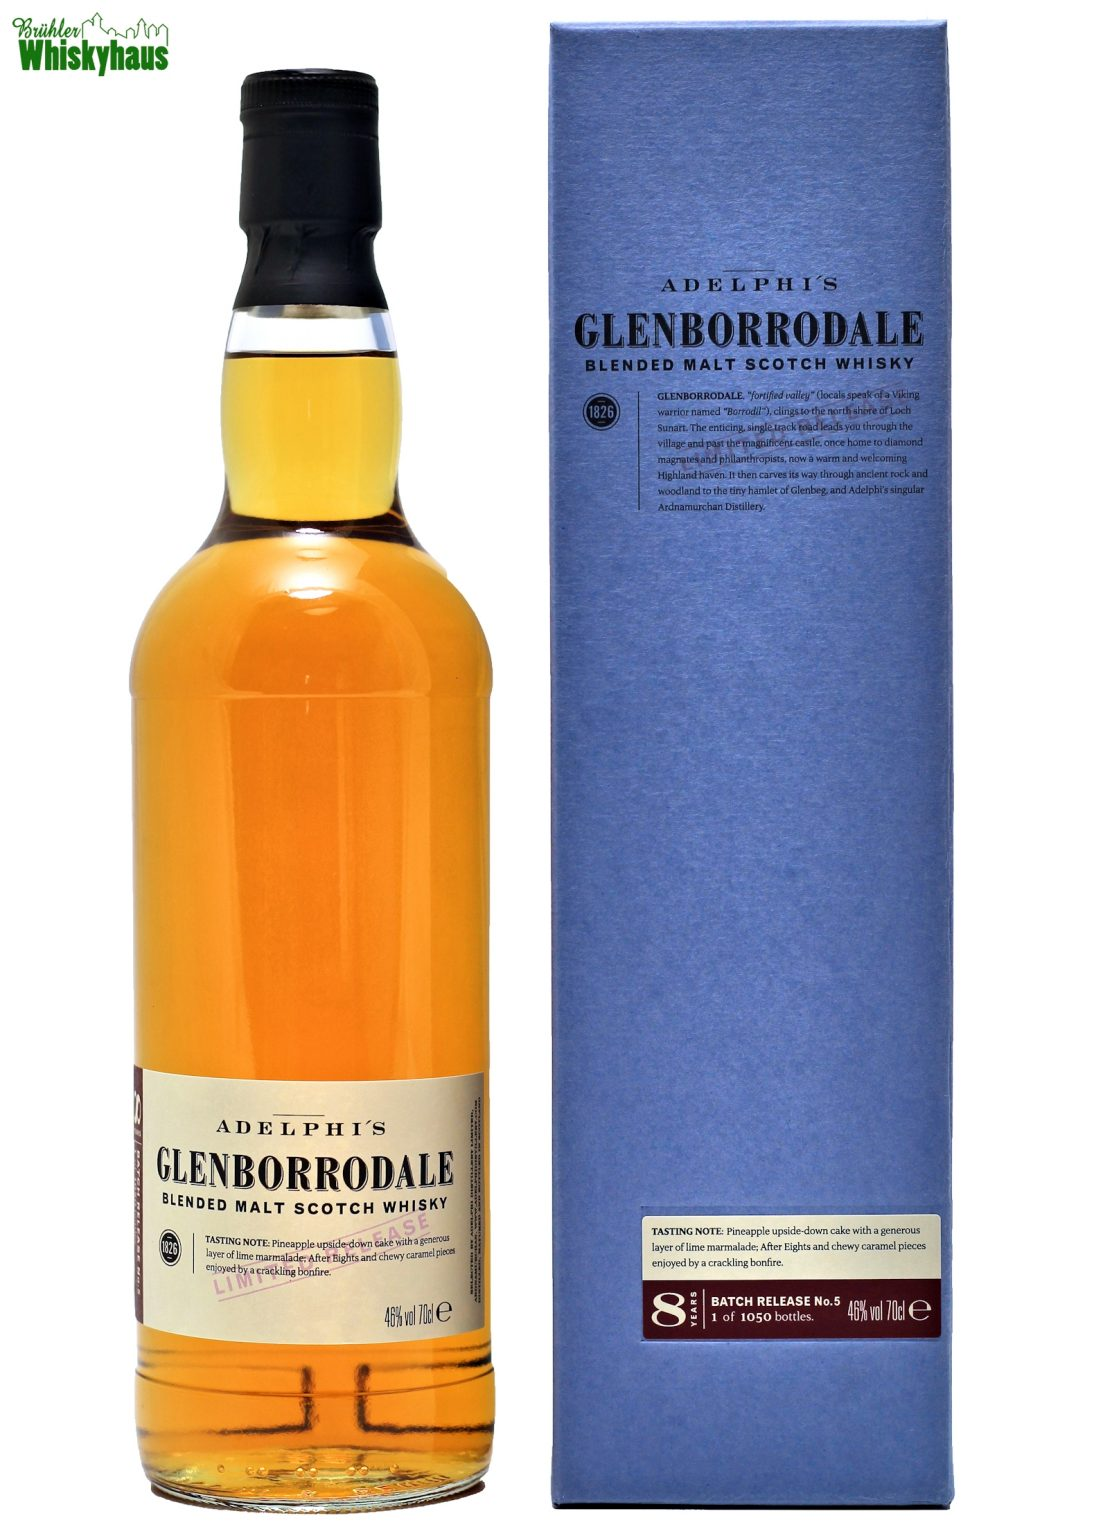 Adelphies Glenborrodale 8 Jahre - Batch No. 5 - Blended Scotch Whisky